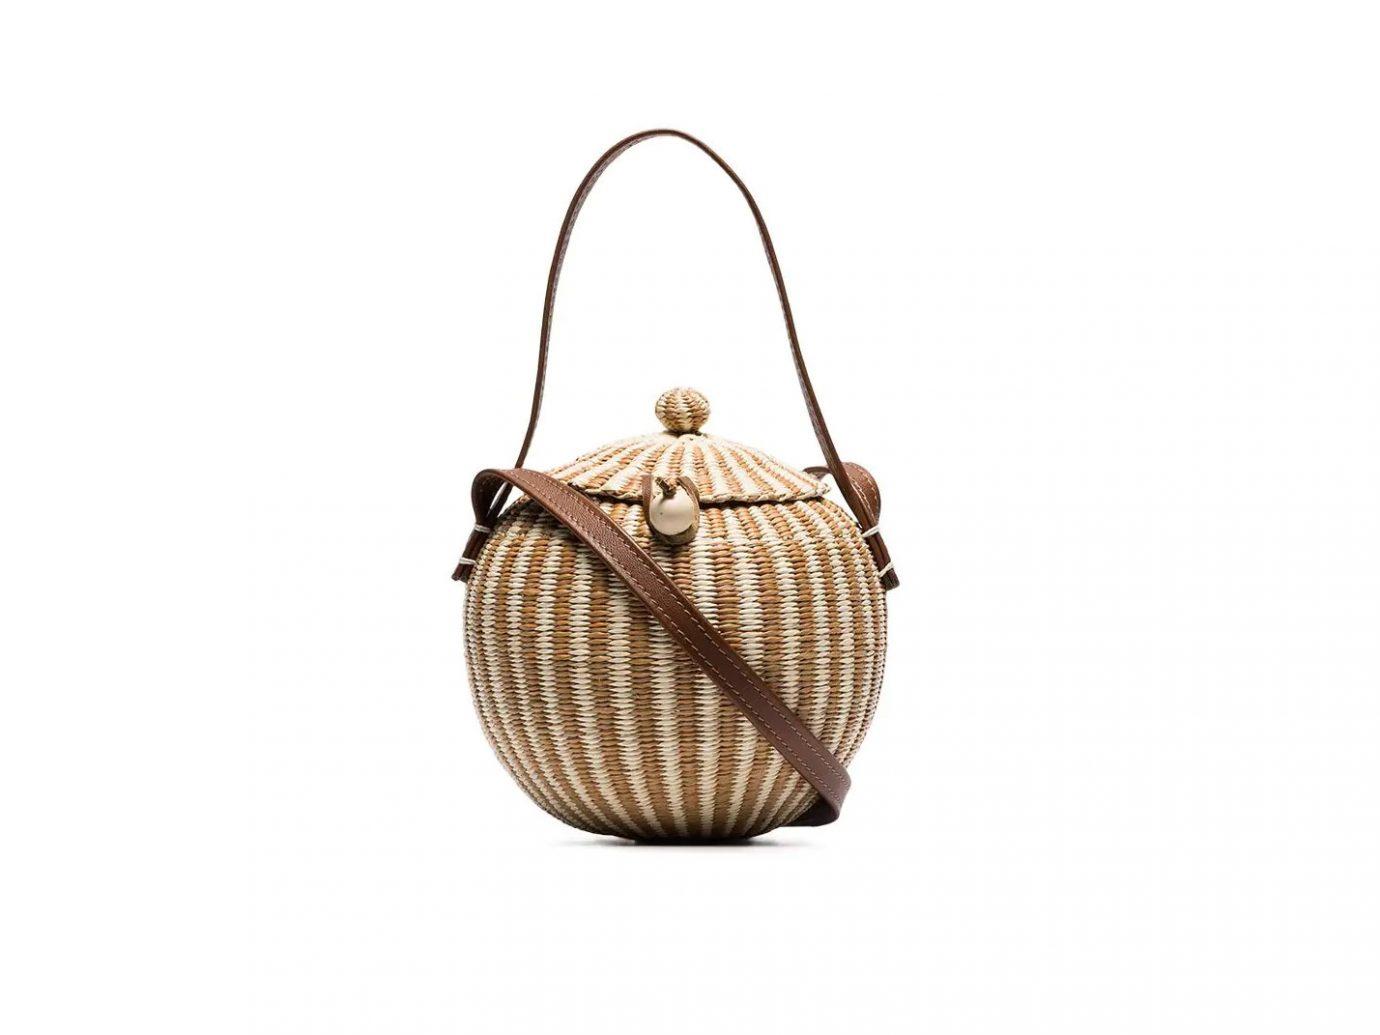 Sensi Studio Brown Coco Straw and Leather Bag